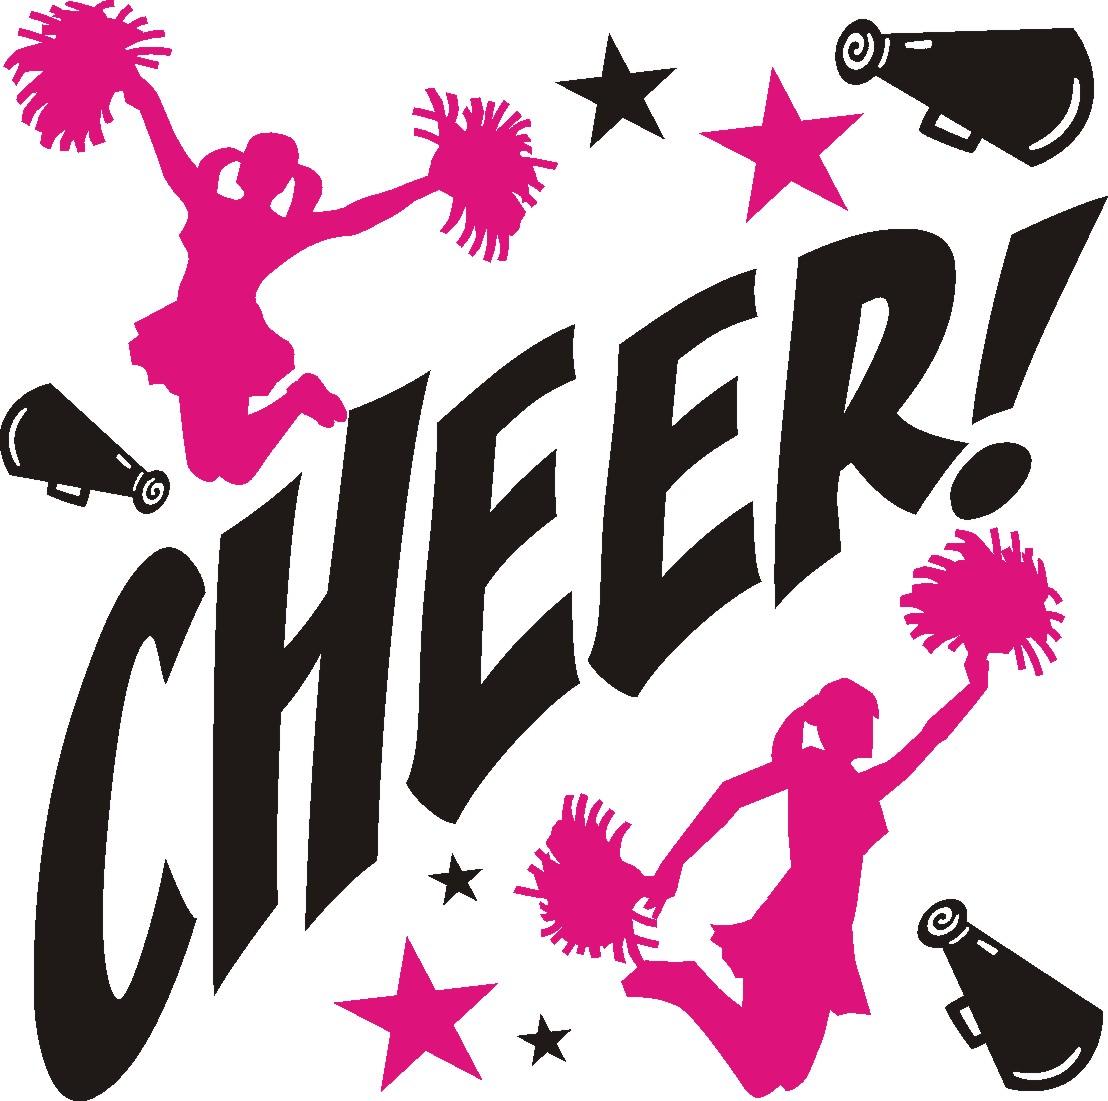 clip art cheerleader pictures - photo #44